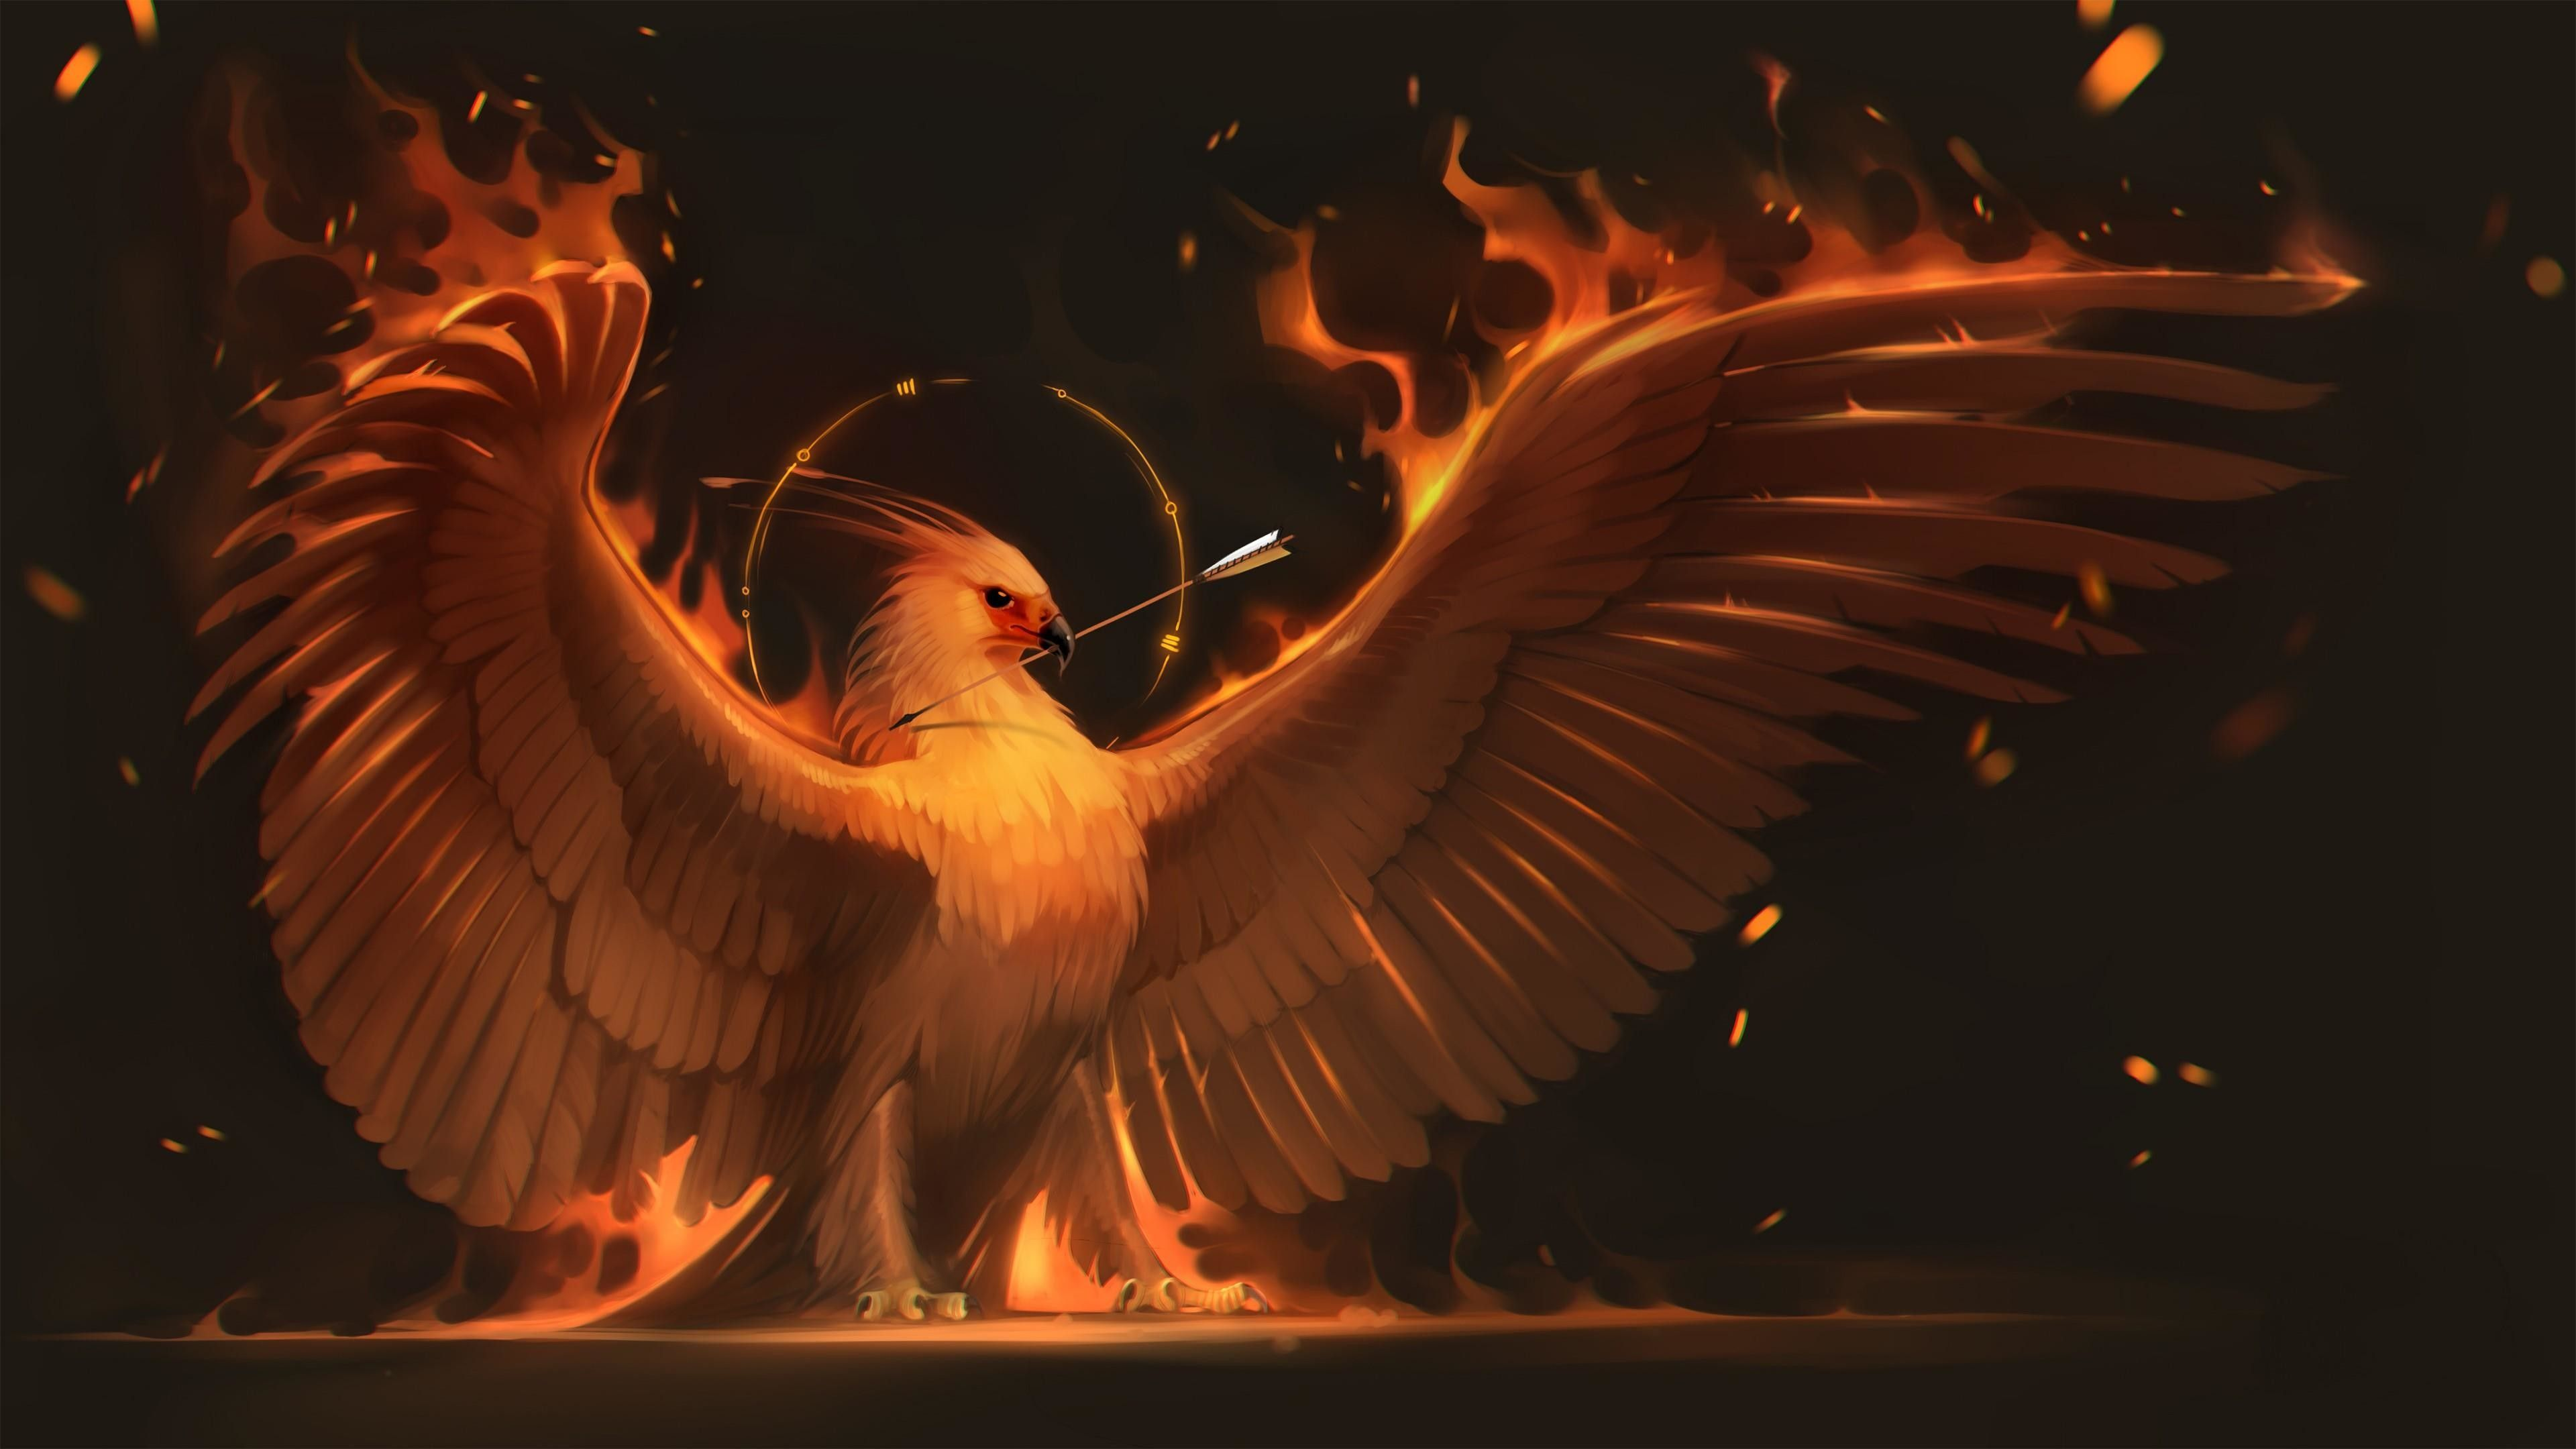 80 Phoenix Bird Wallpapers On Wallpaperplay Phoenix Bird Art Phoenix Wallpaper Phoenix Mythology